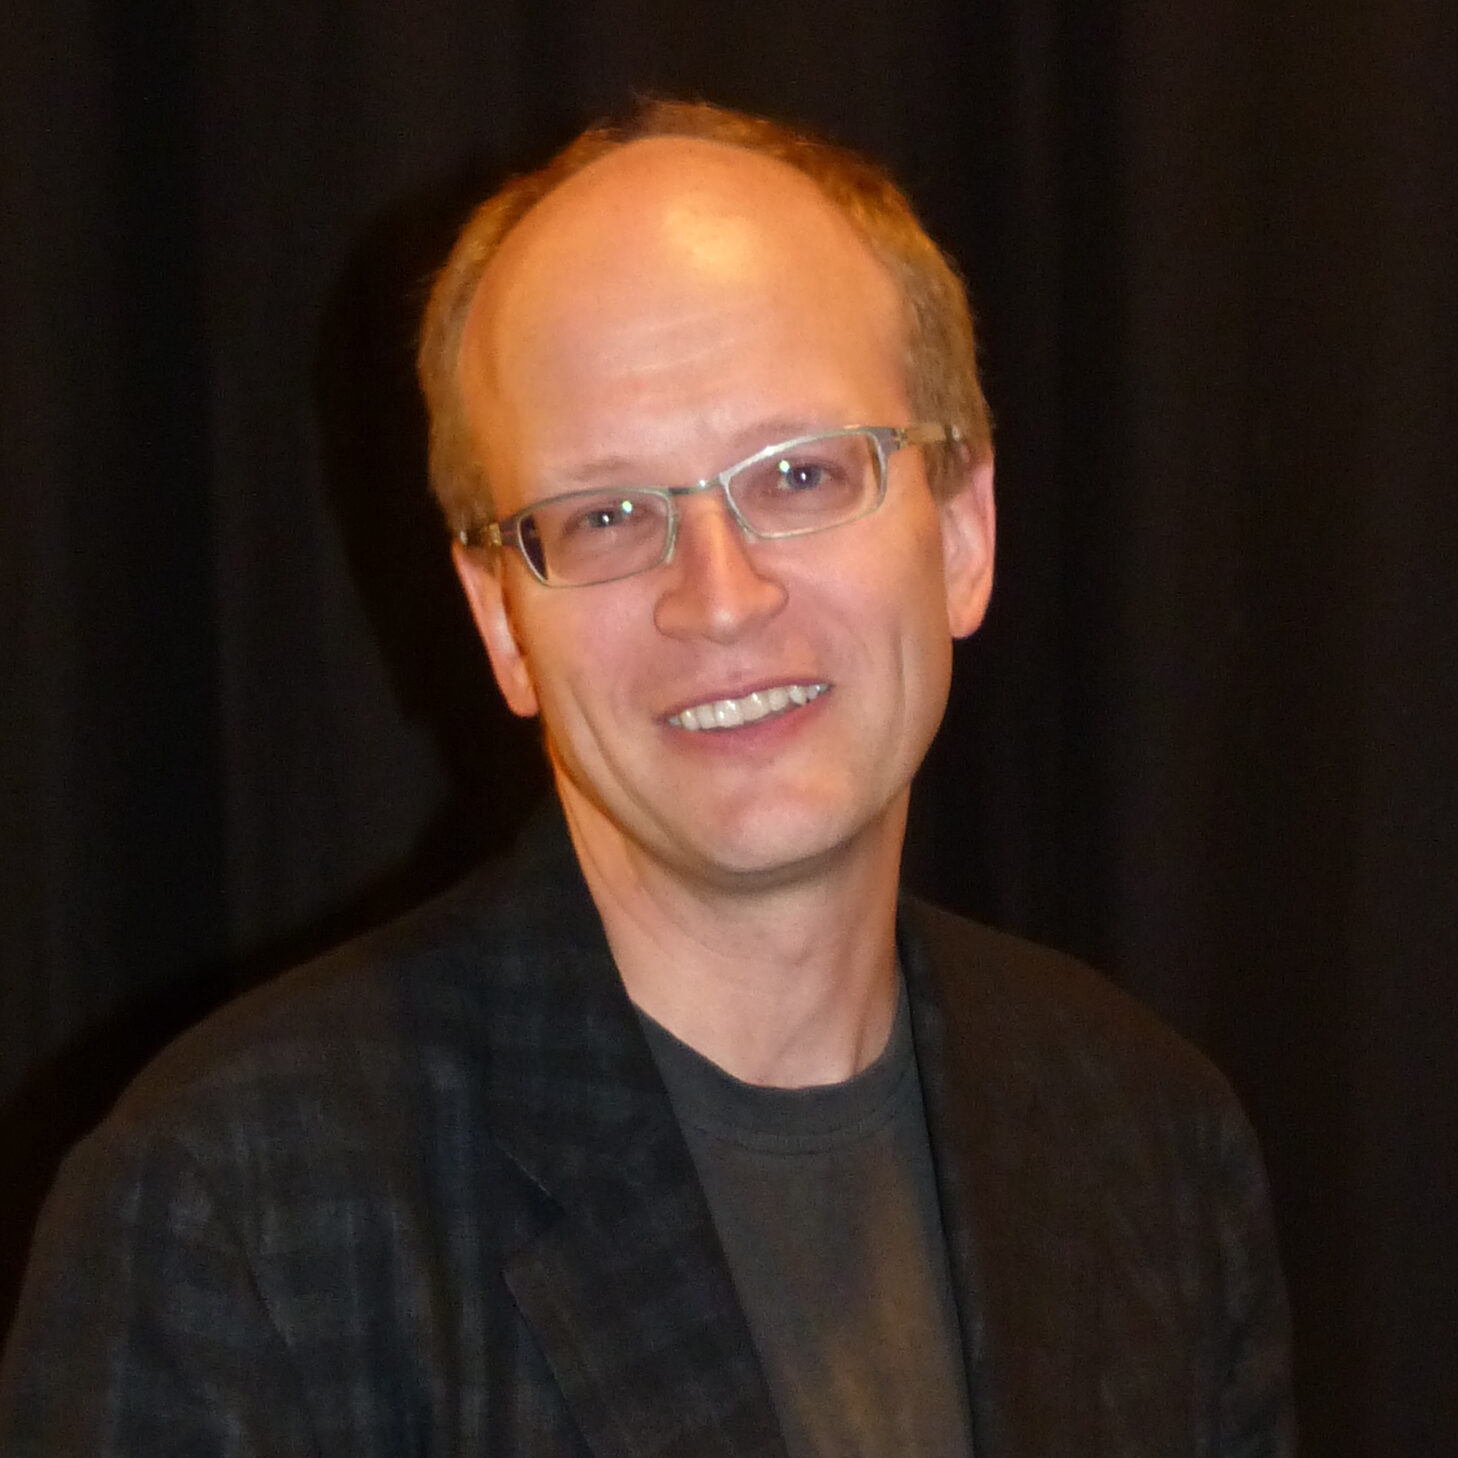 Andreas Platthaus